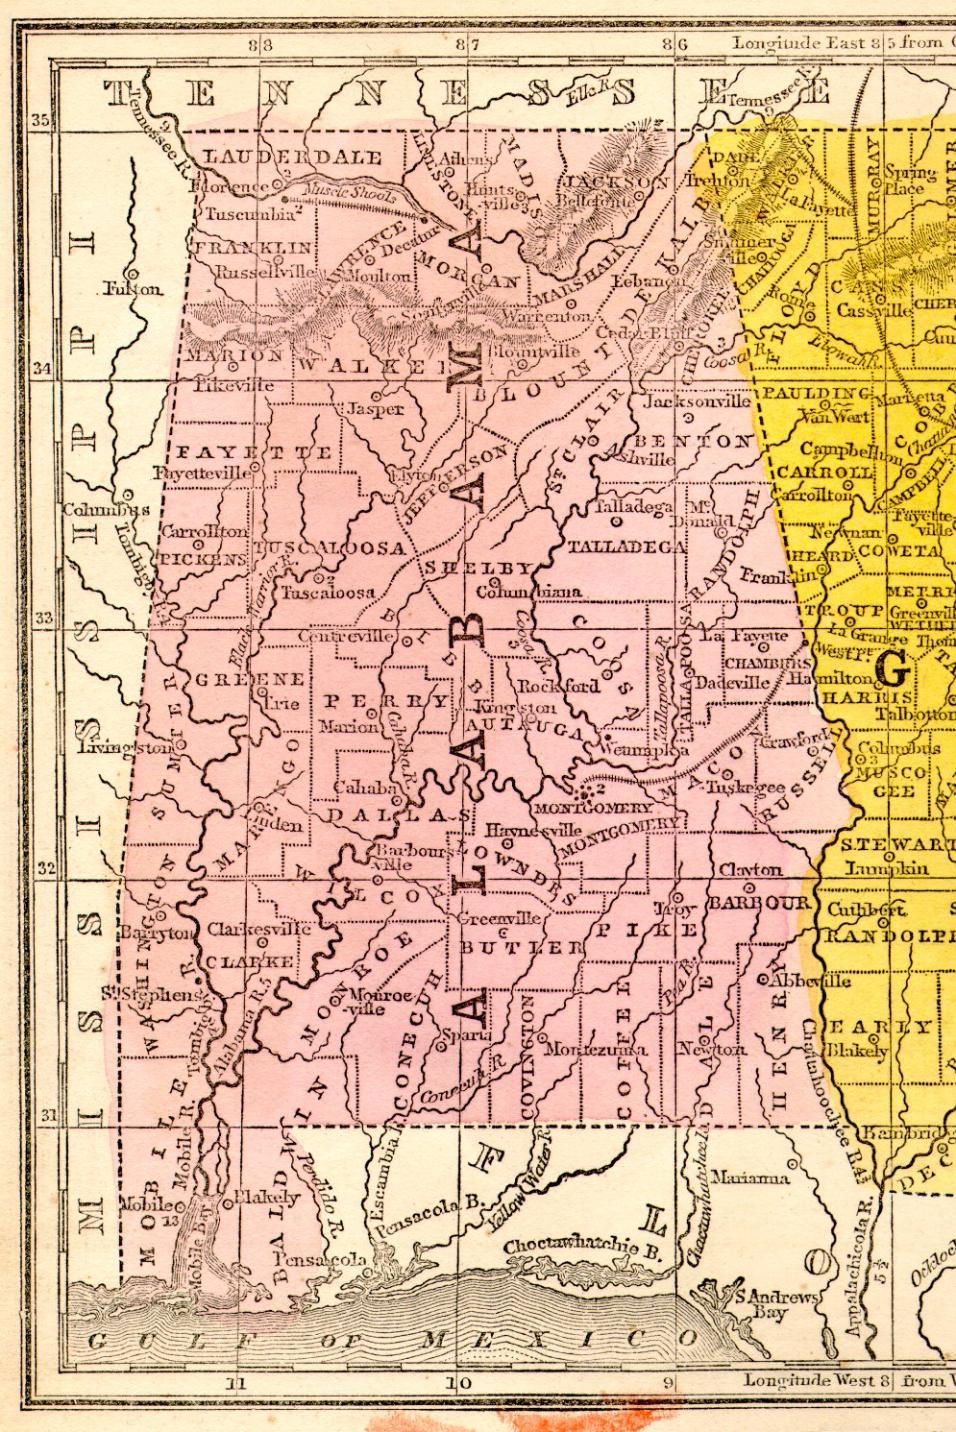 1851 Alabama State Map